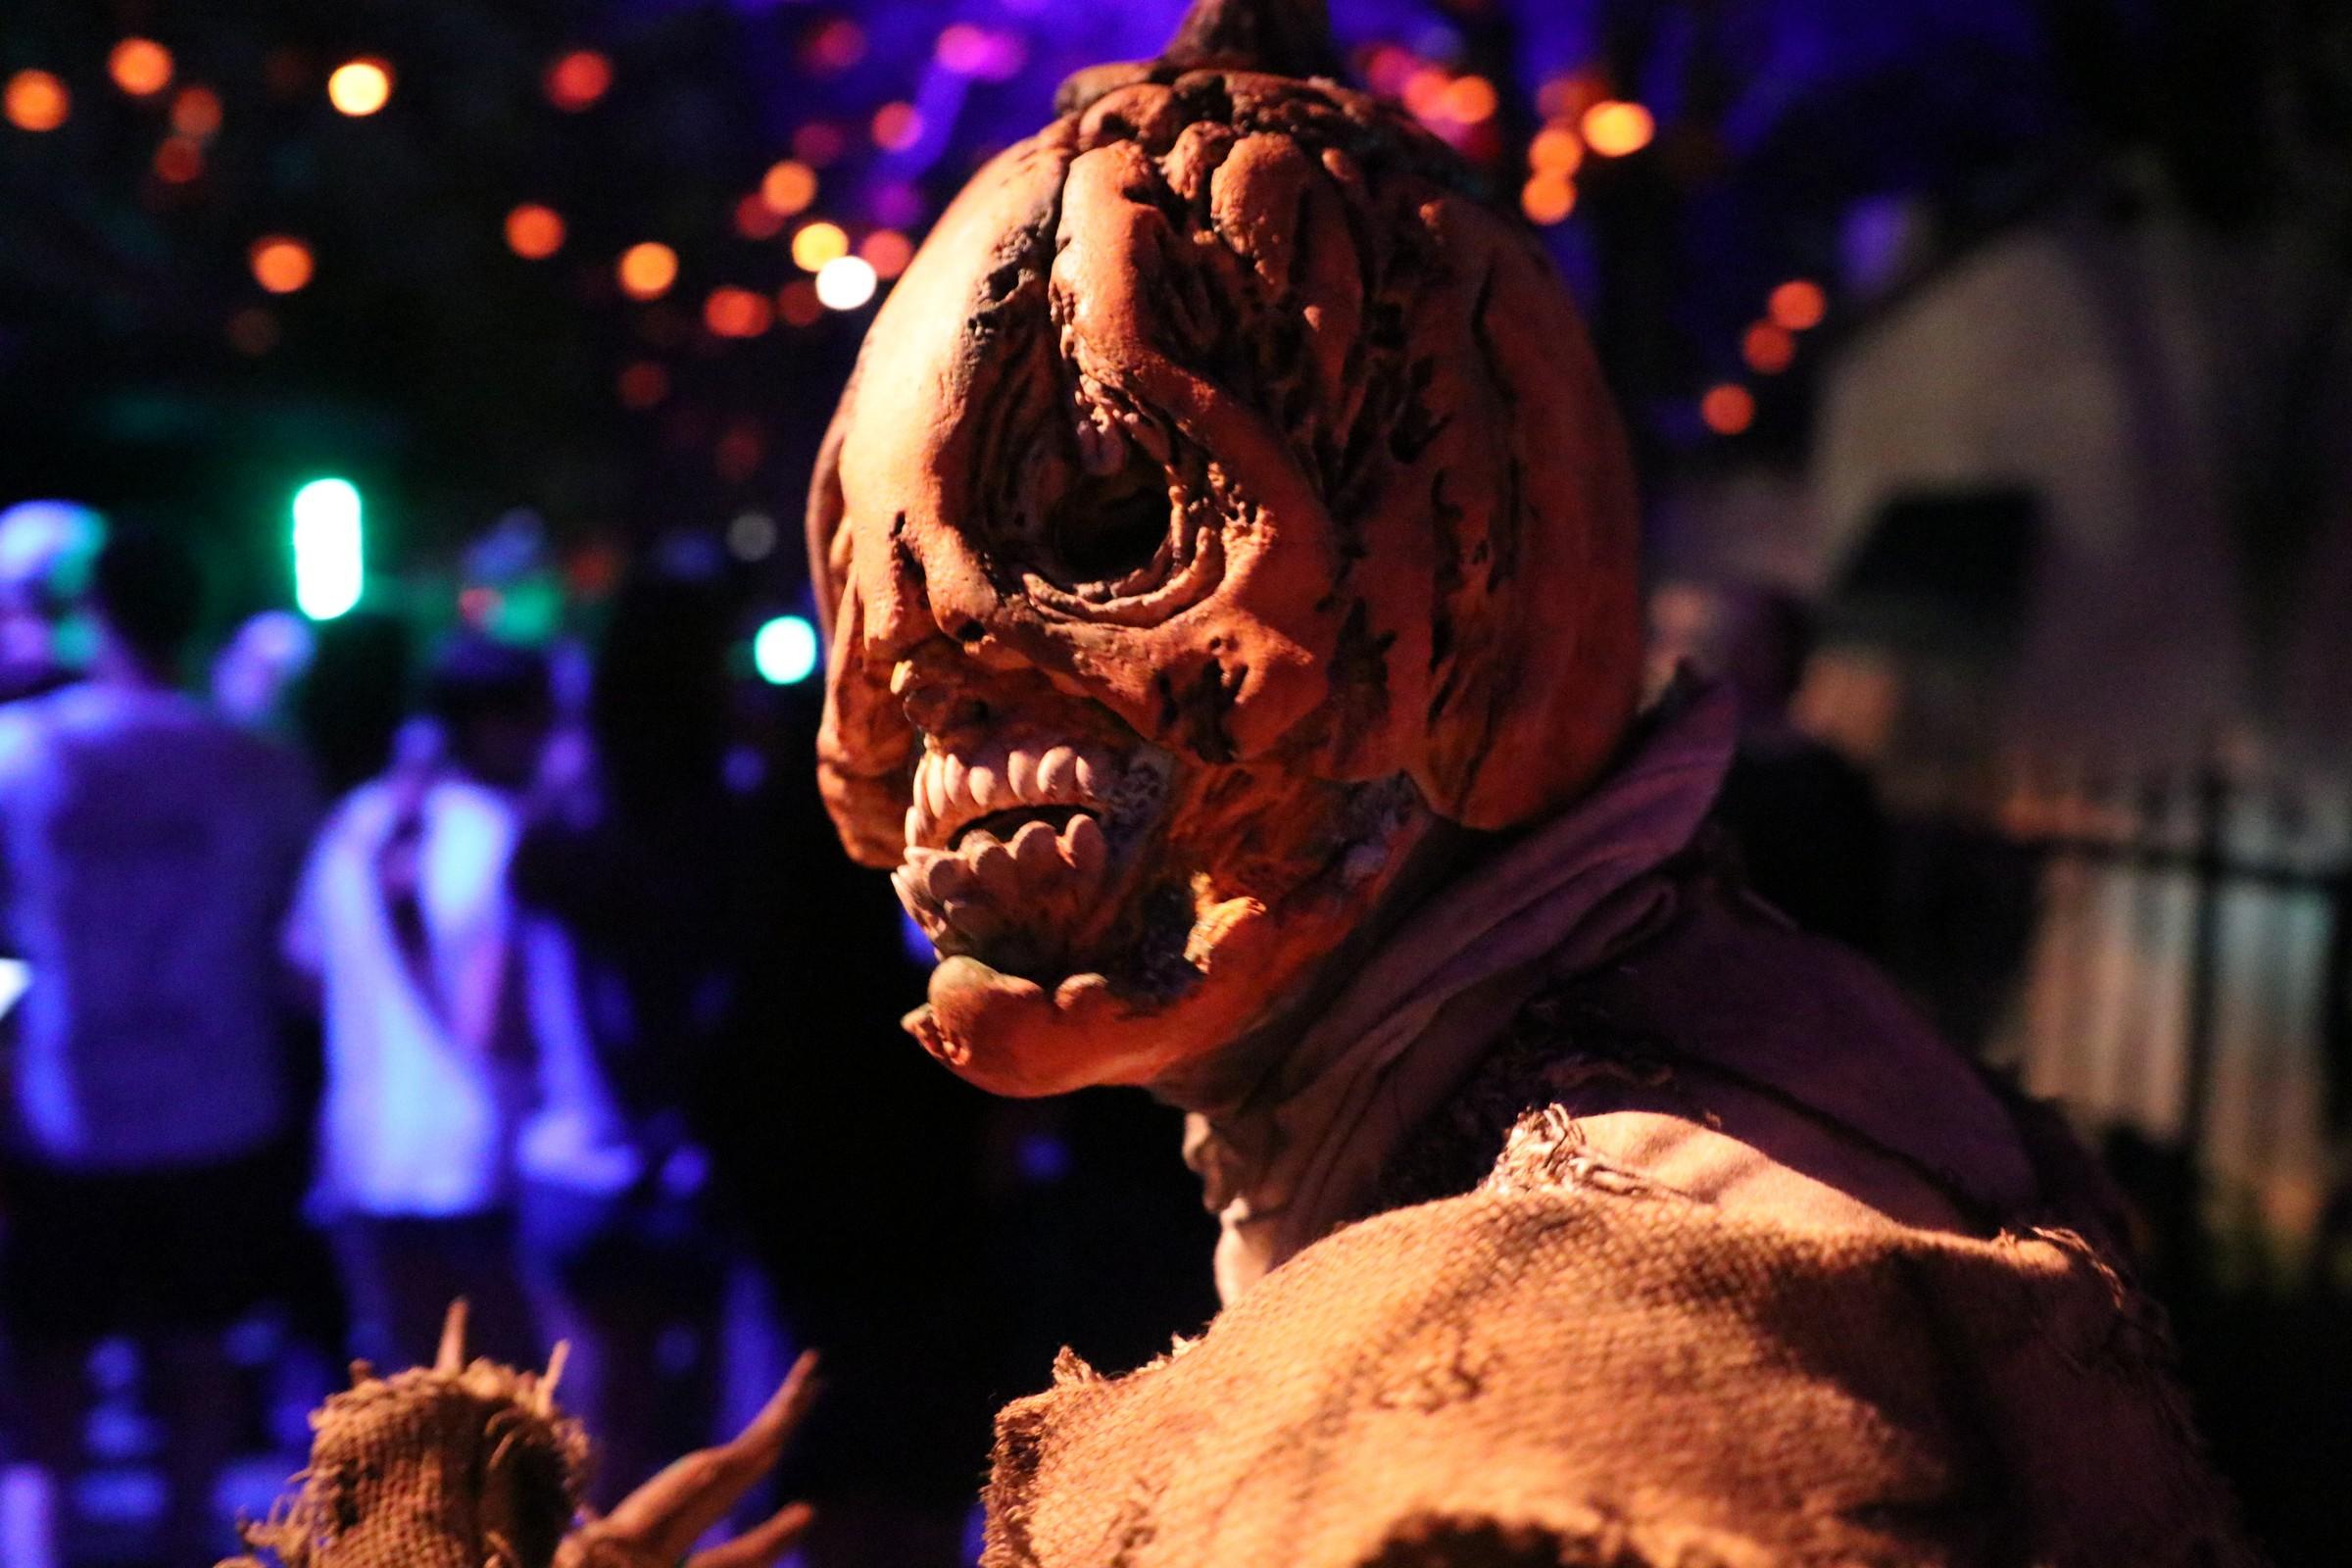 Universal Orlando announces Halloween Horror Nights 2019